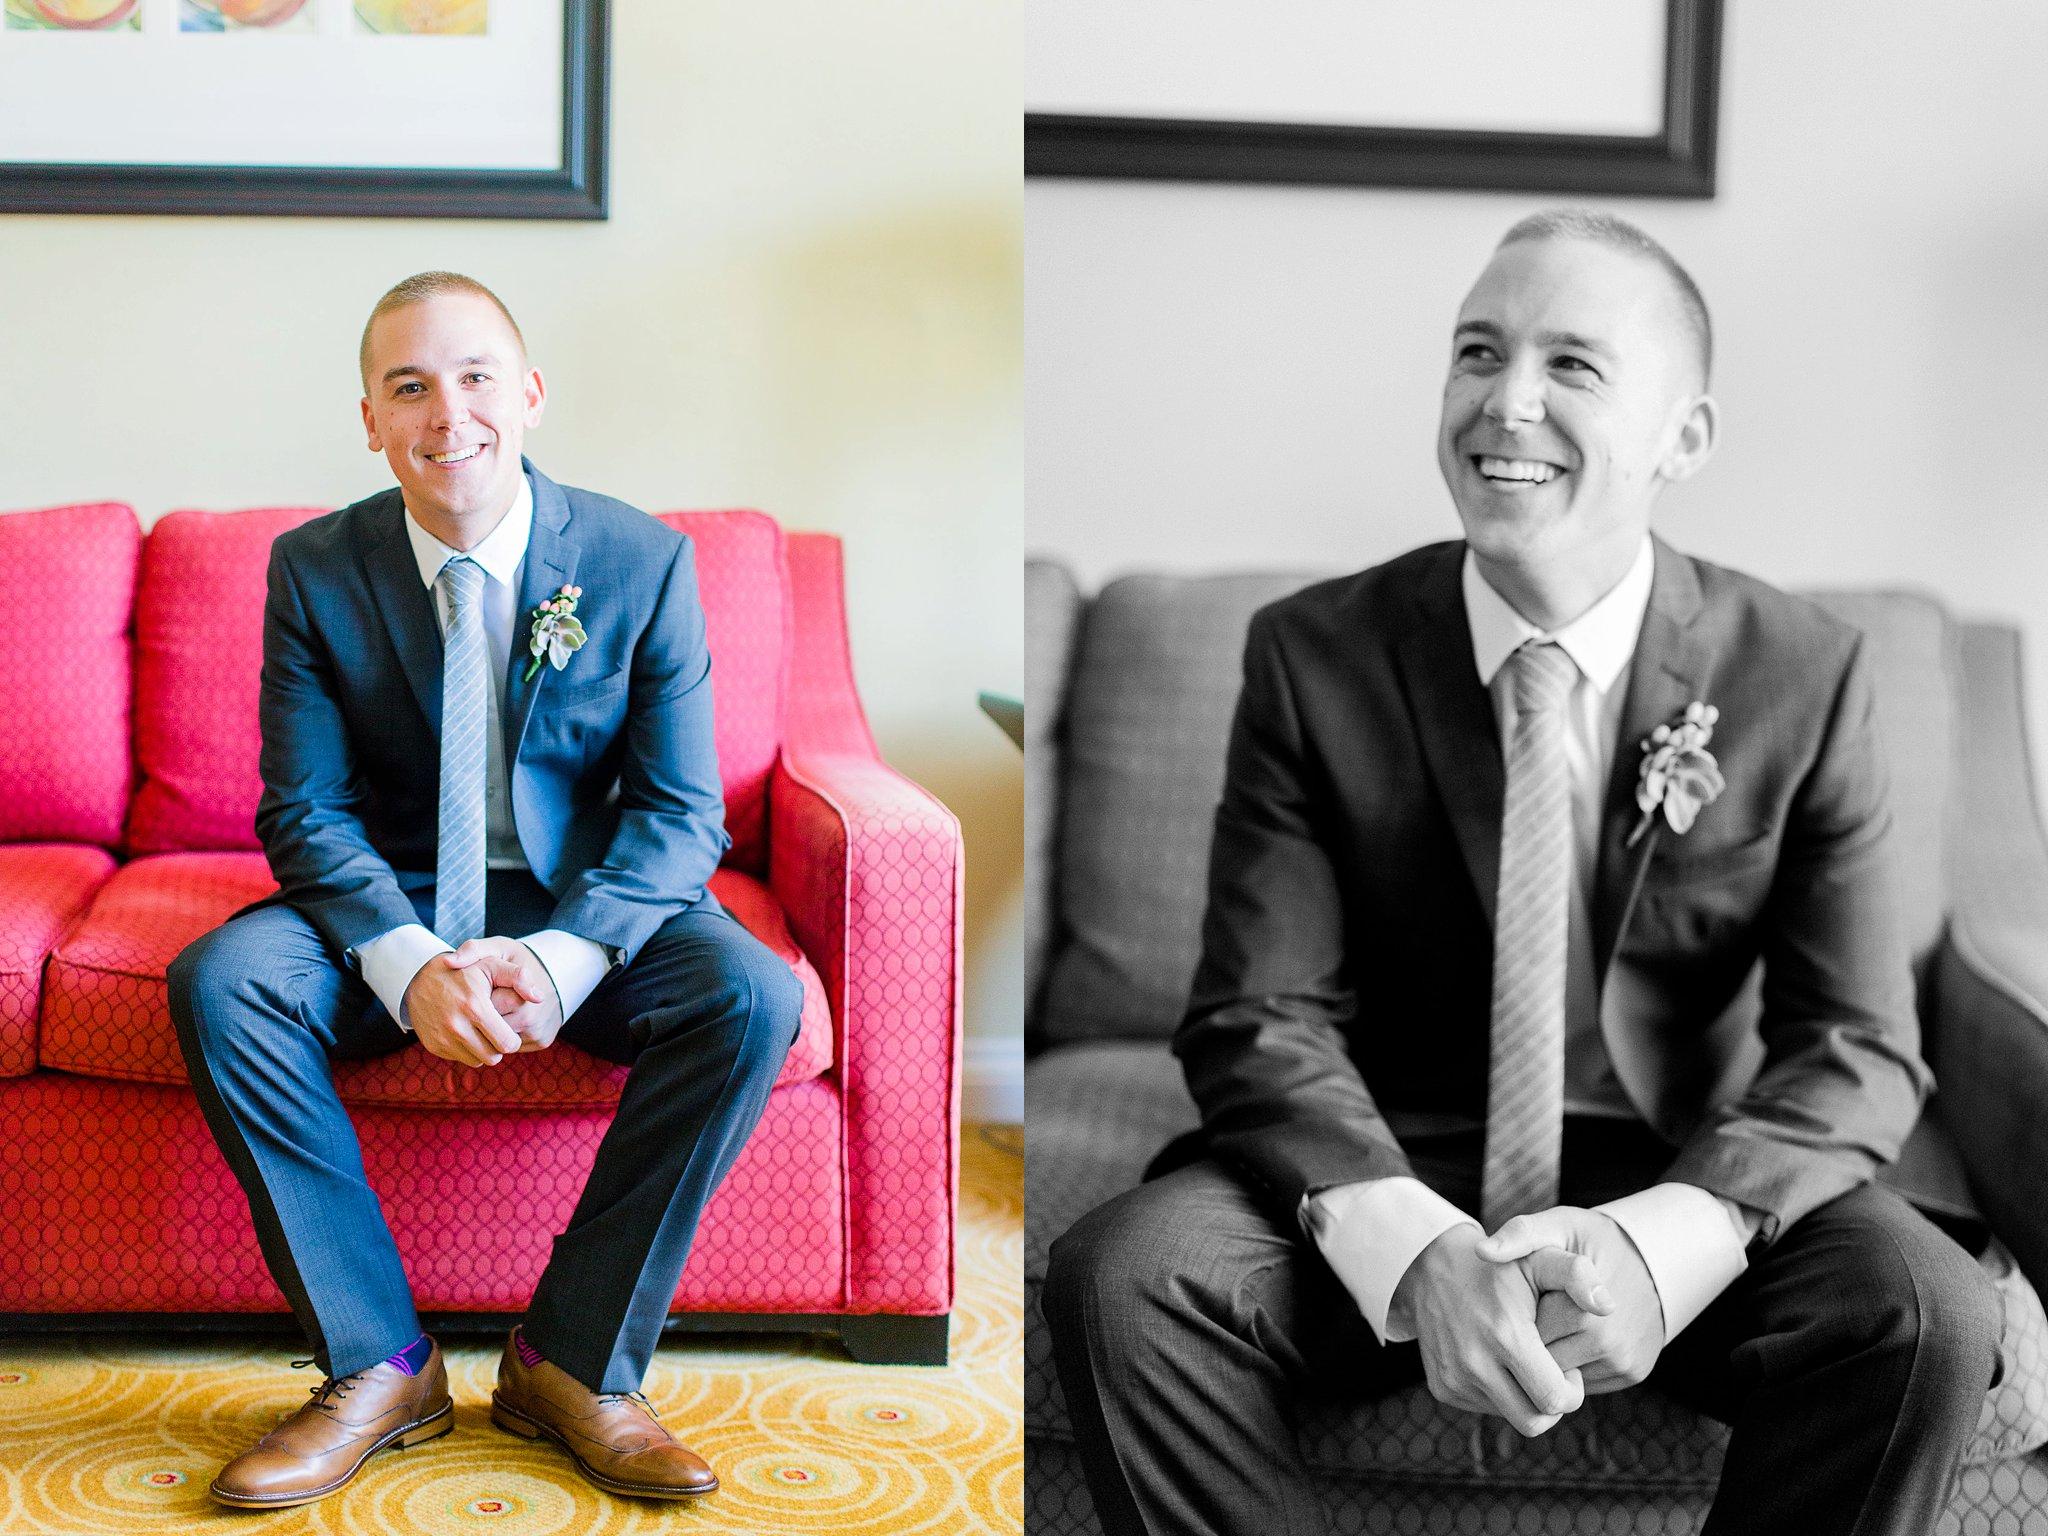 Evergreen Museum & Library Wedding Photos Baltimore Wedding Photographer Kim & Max Megan Kelsey Photography-64.jpg